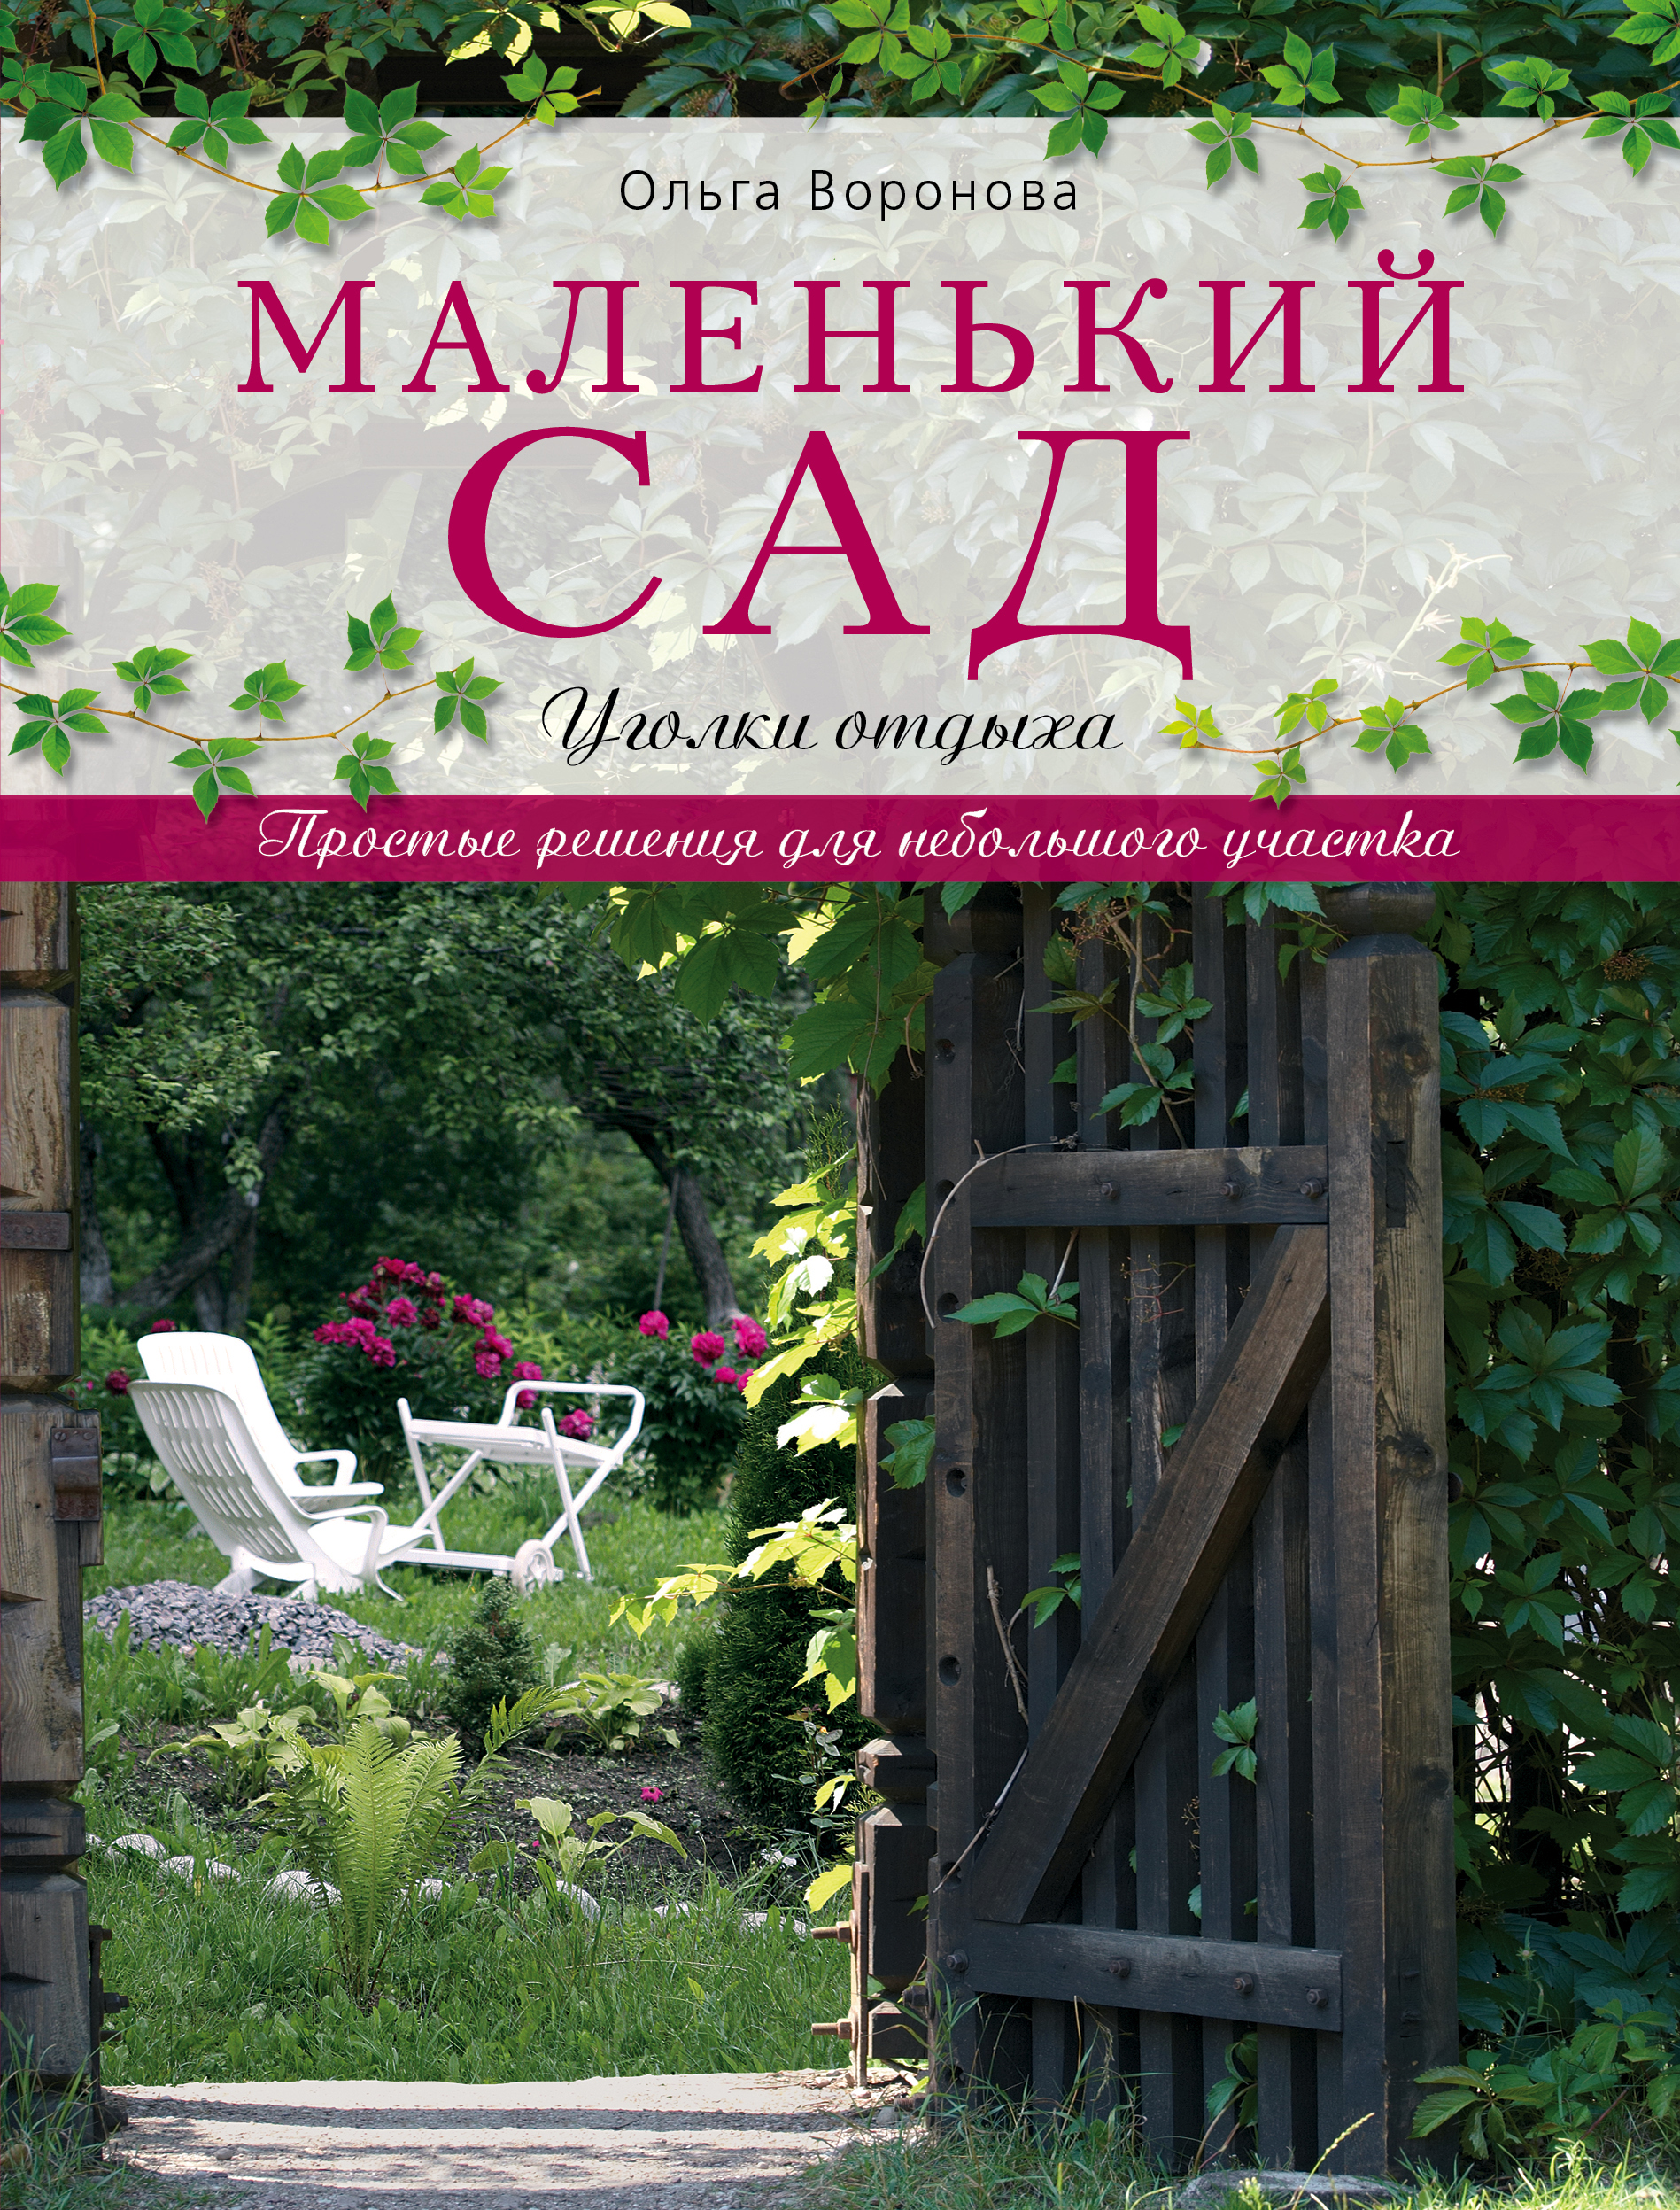 Книга Маленький сад. Уголки отдыха